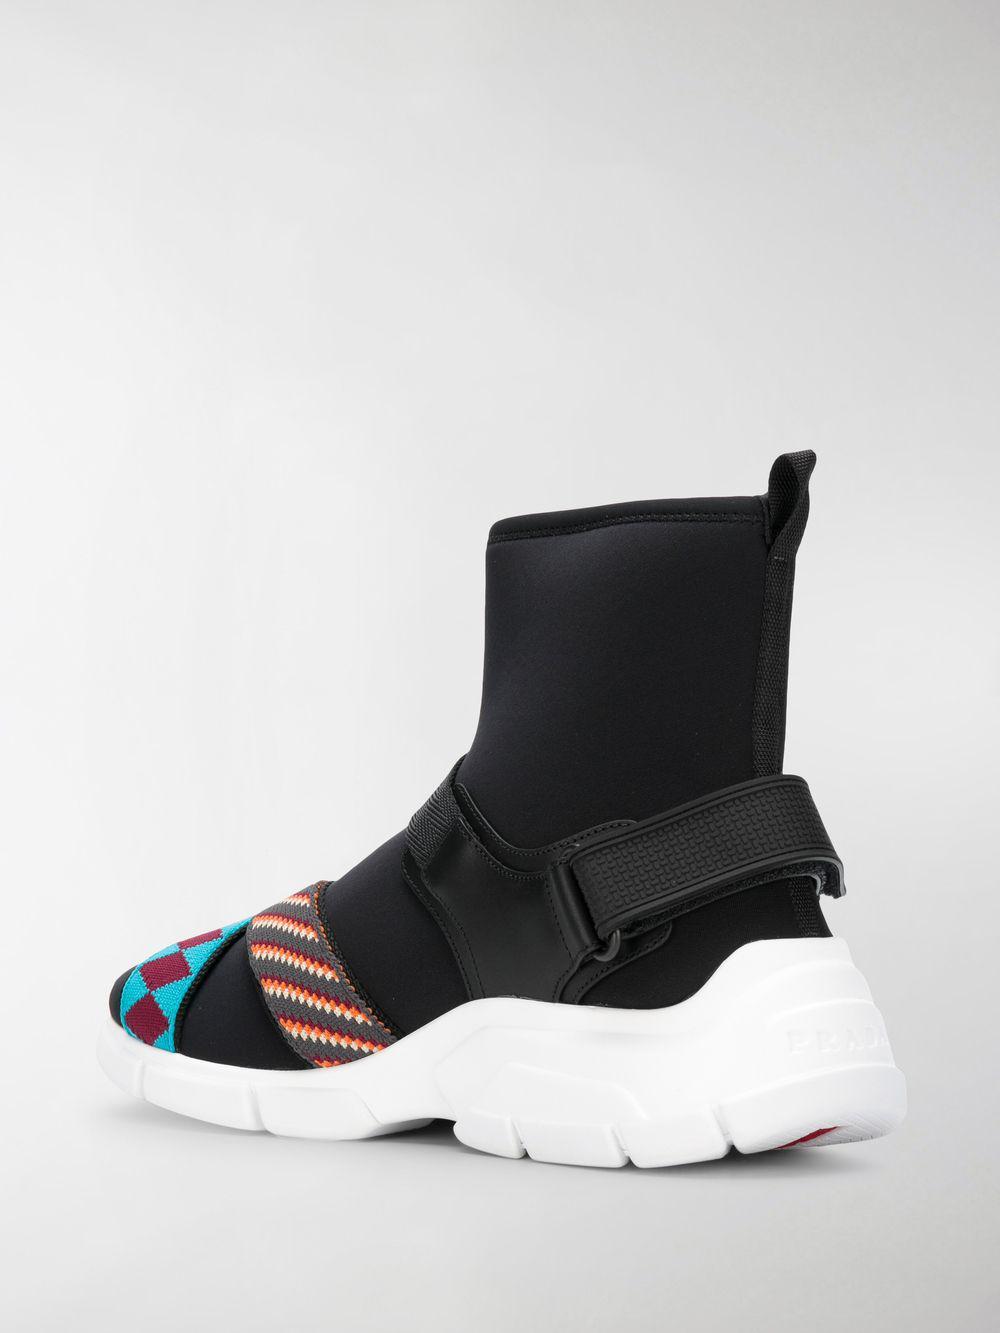 Prada Woven-trimmed Neoprene High-top Sneakers Black